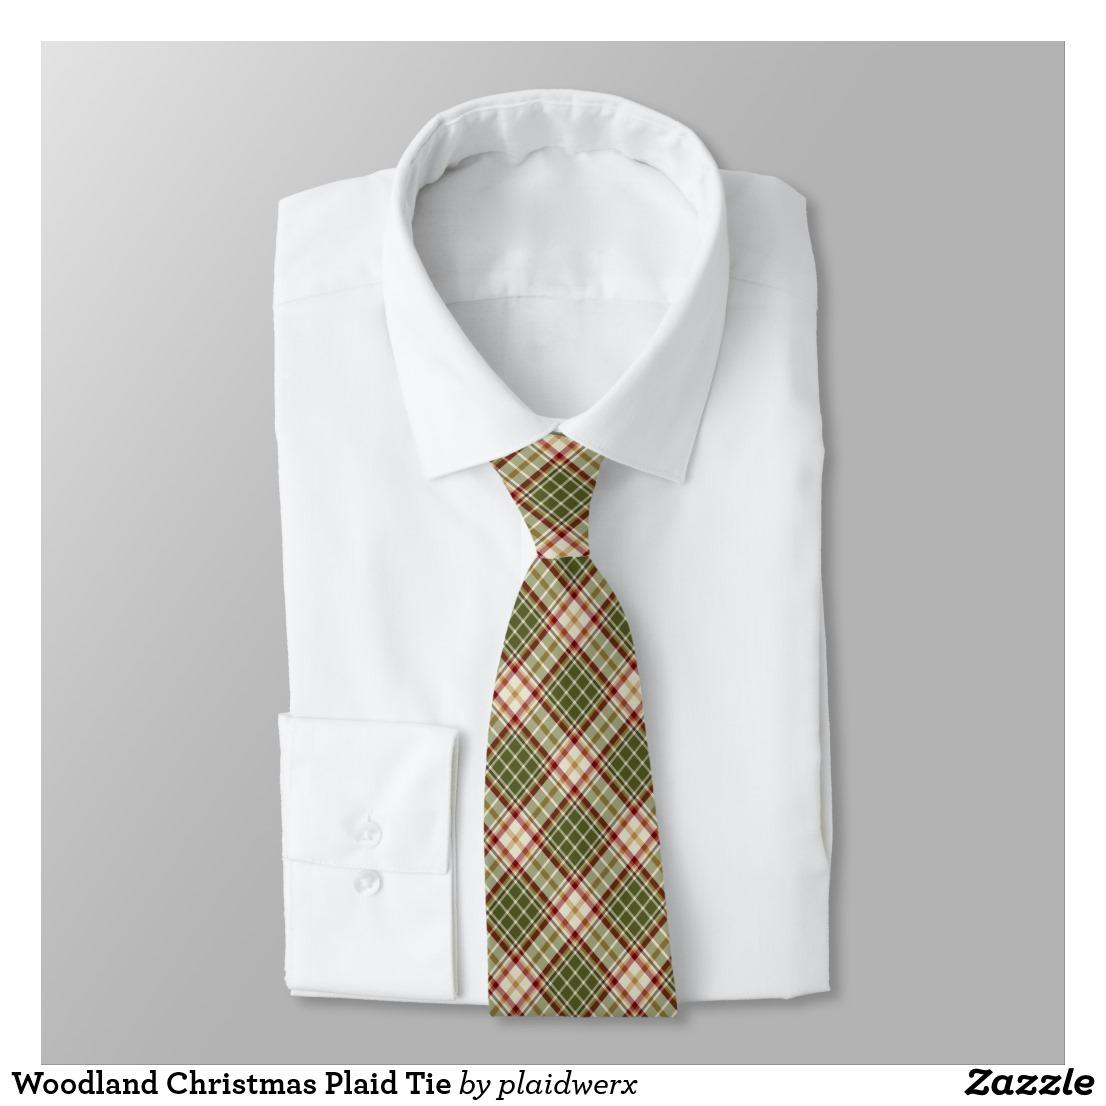 Woodland Christmas Plaid Tie